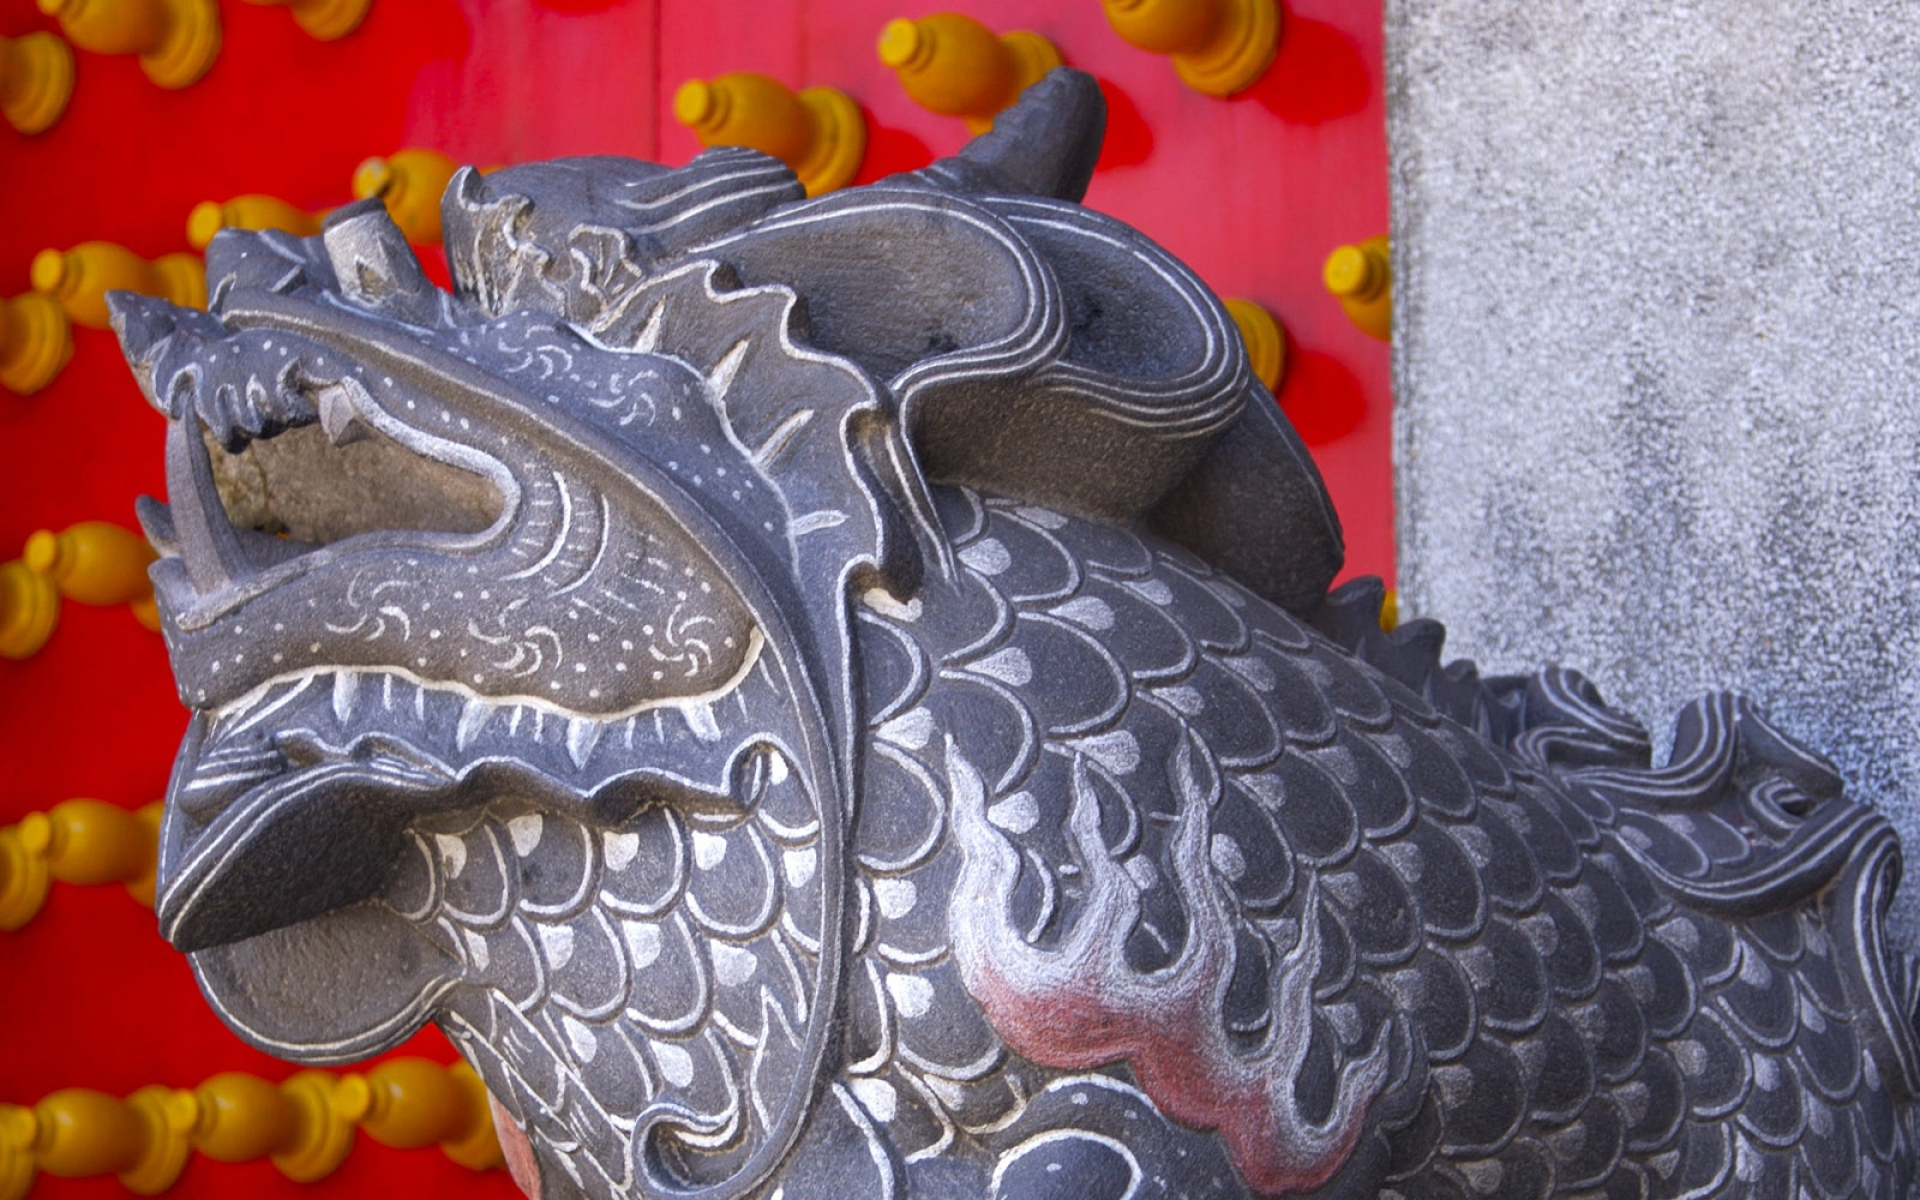 Картинки Скульптура, камень, дракон фото и обои на рабочий стол